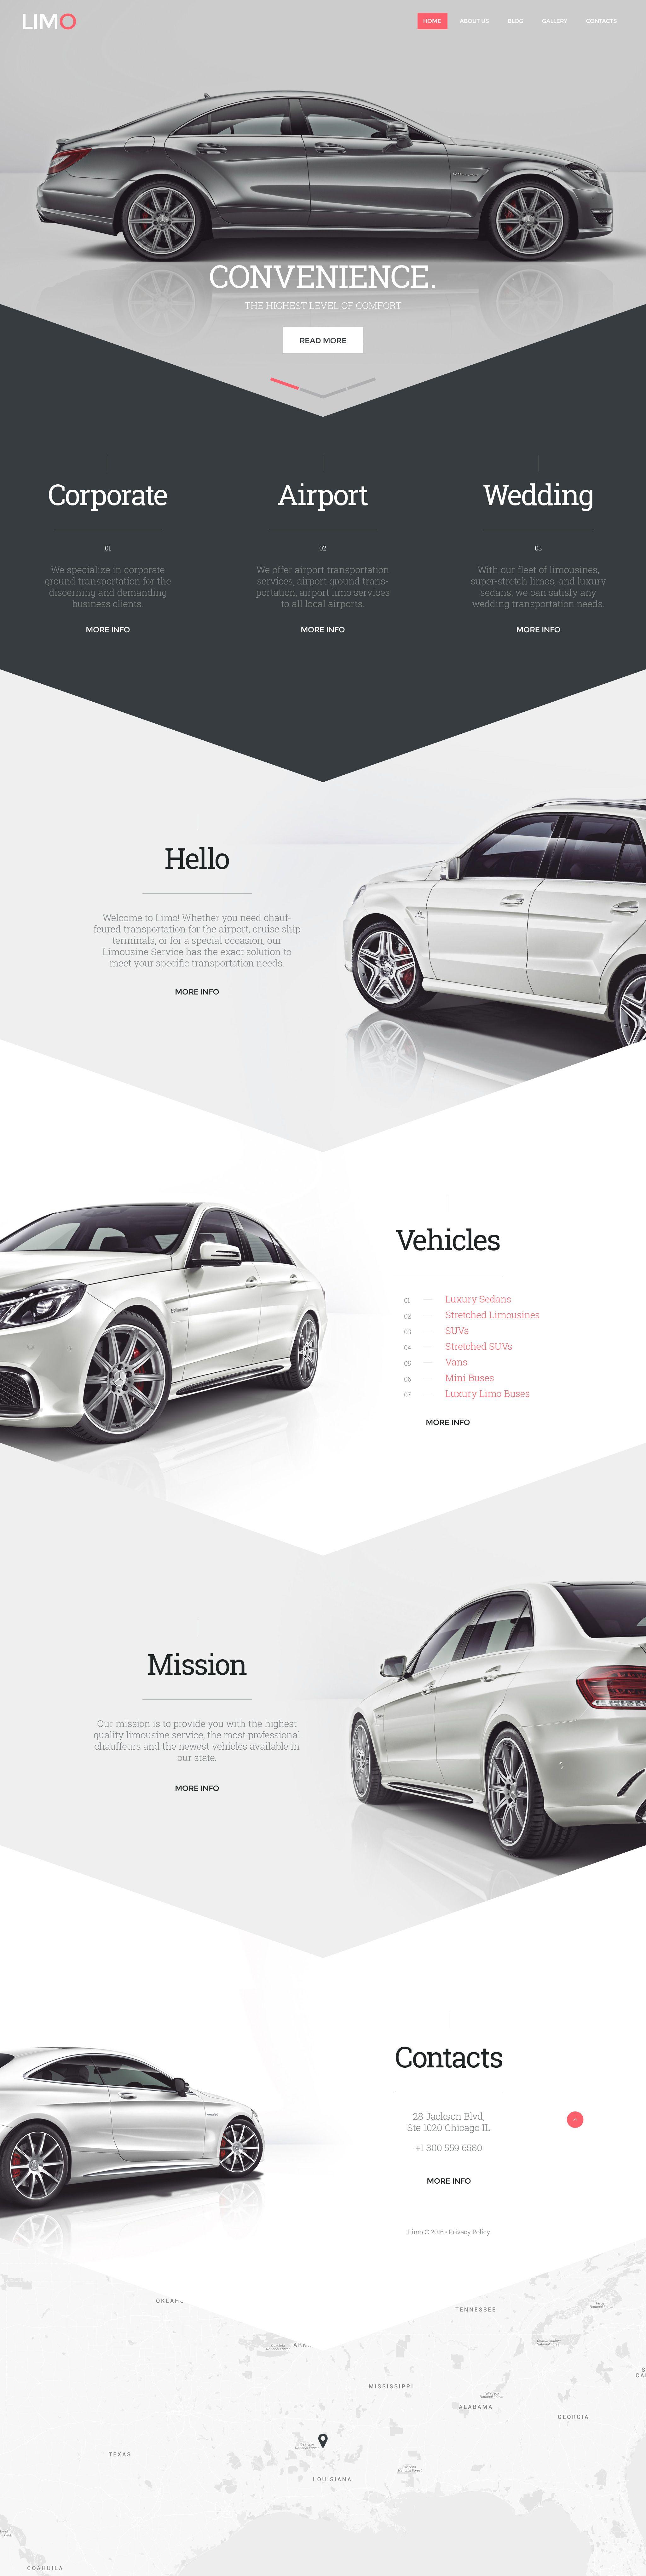 Limo Transportation & Transfer Services Website Template